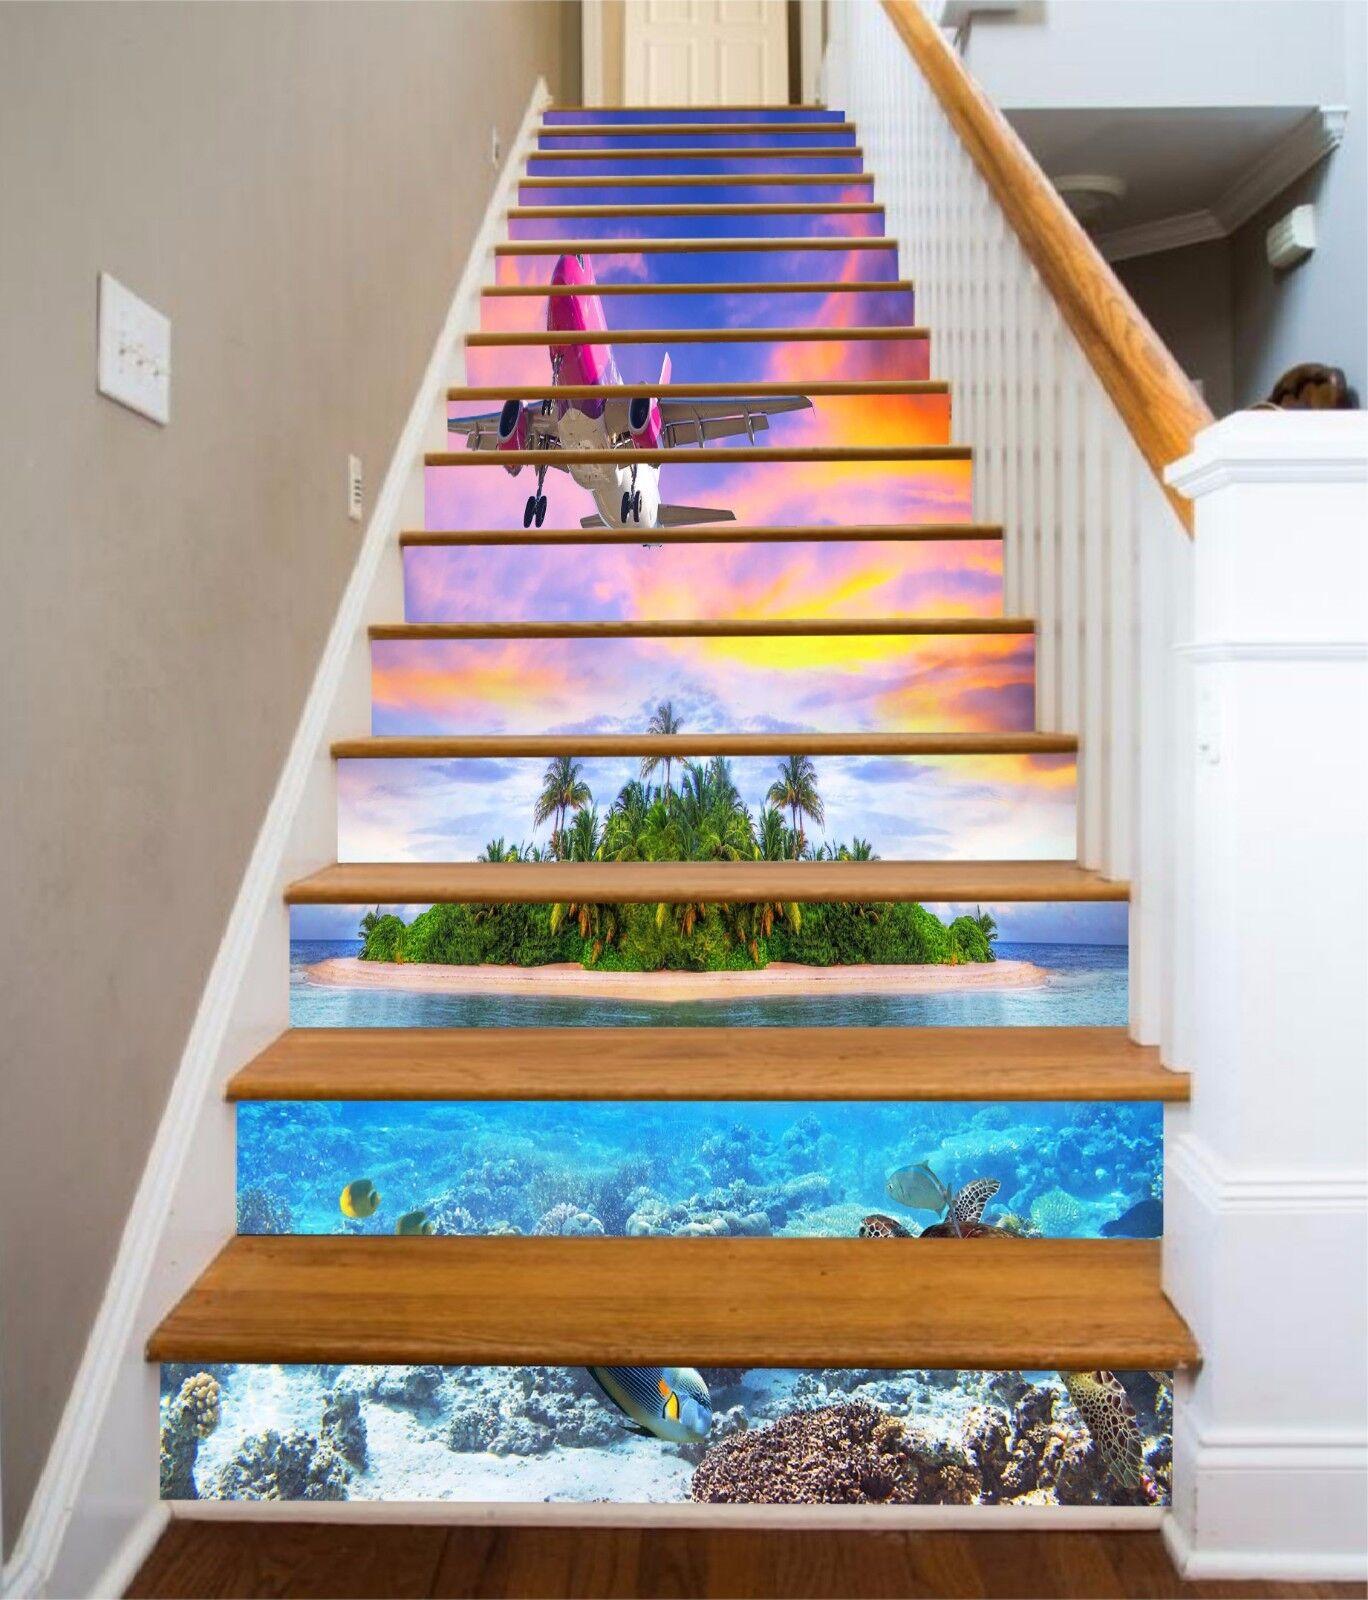 3D Sea Plane 014 Stair Risers Decoration Photo Mural Vinyl Decal WandPapier AU